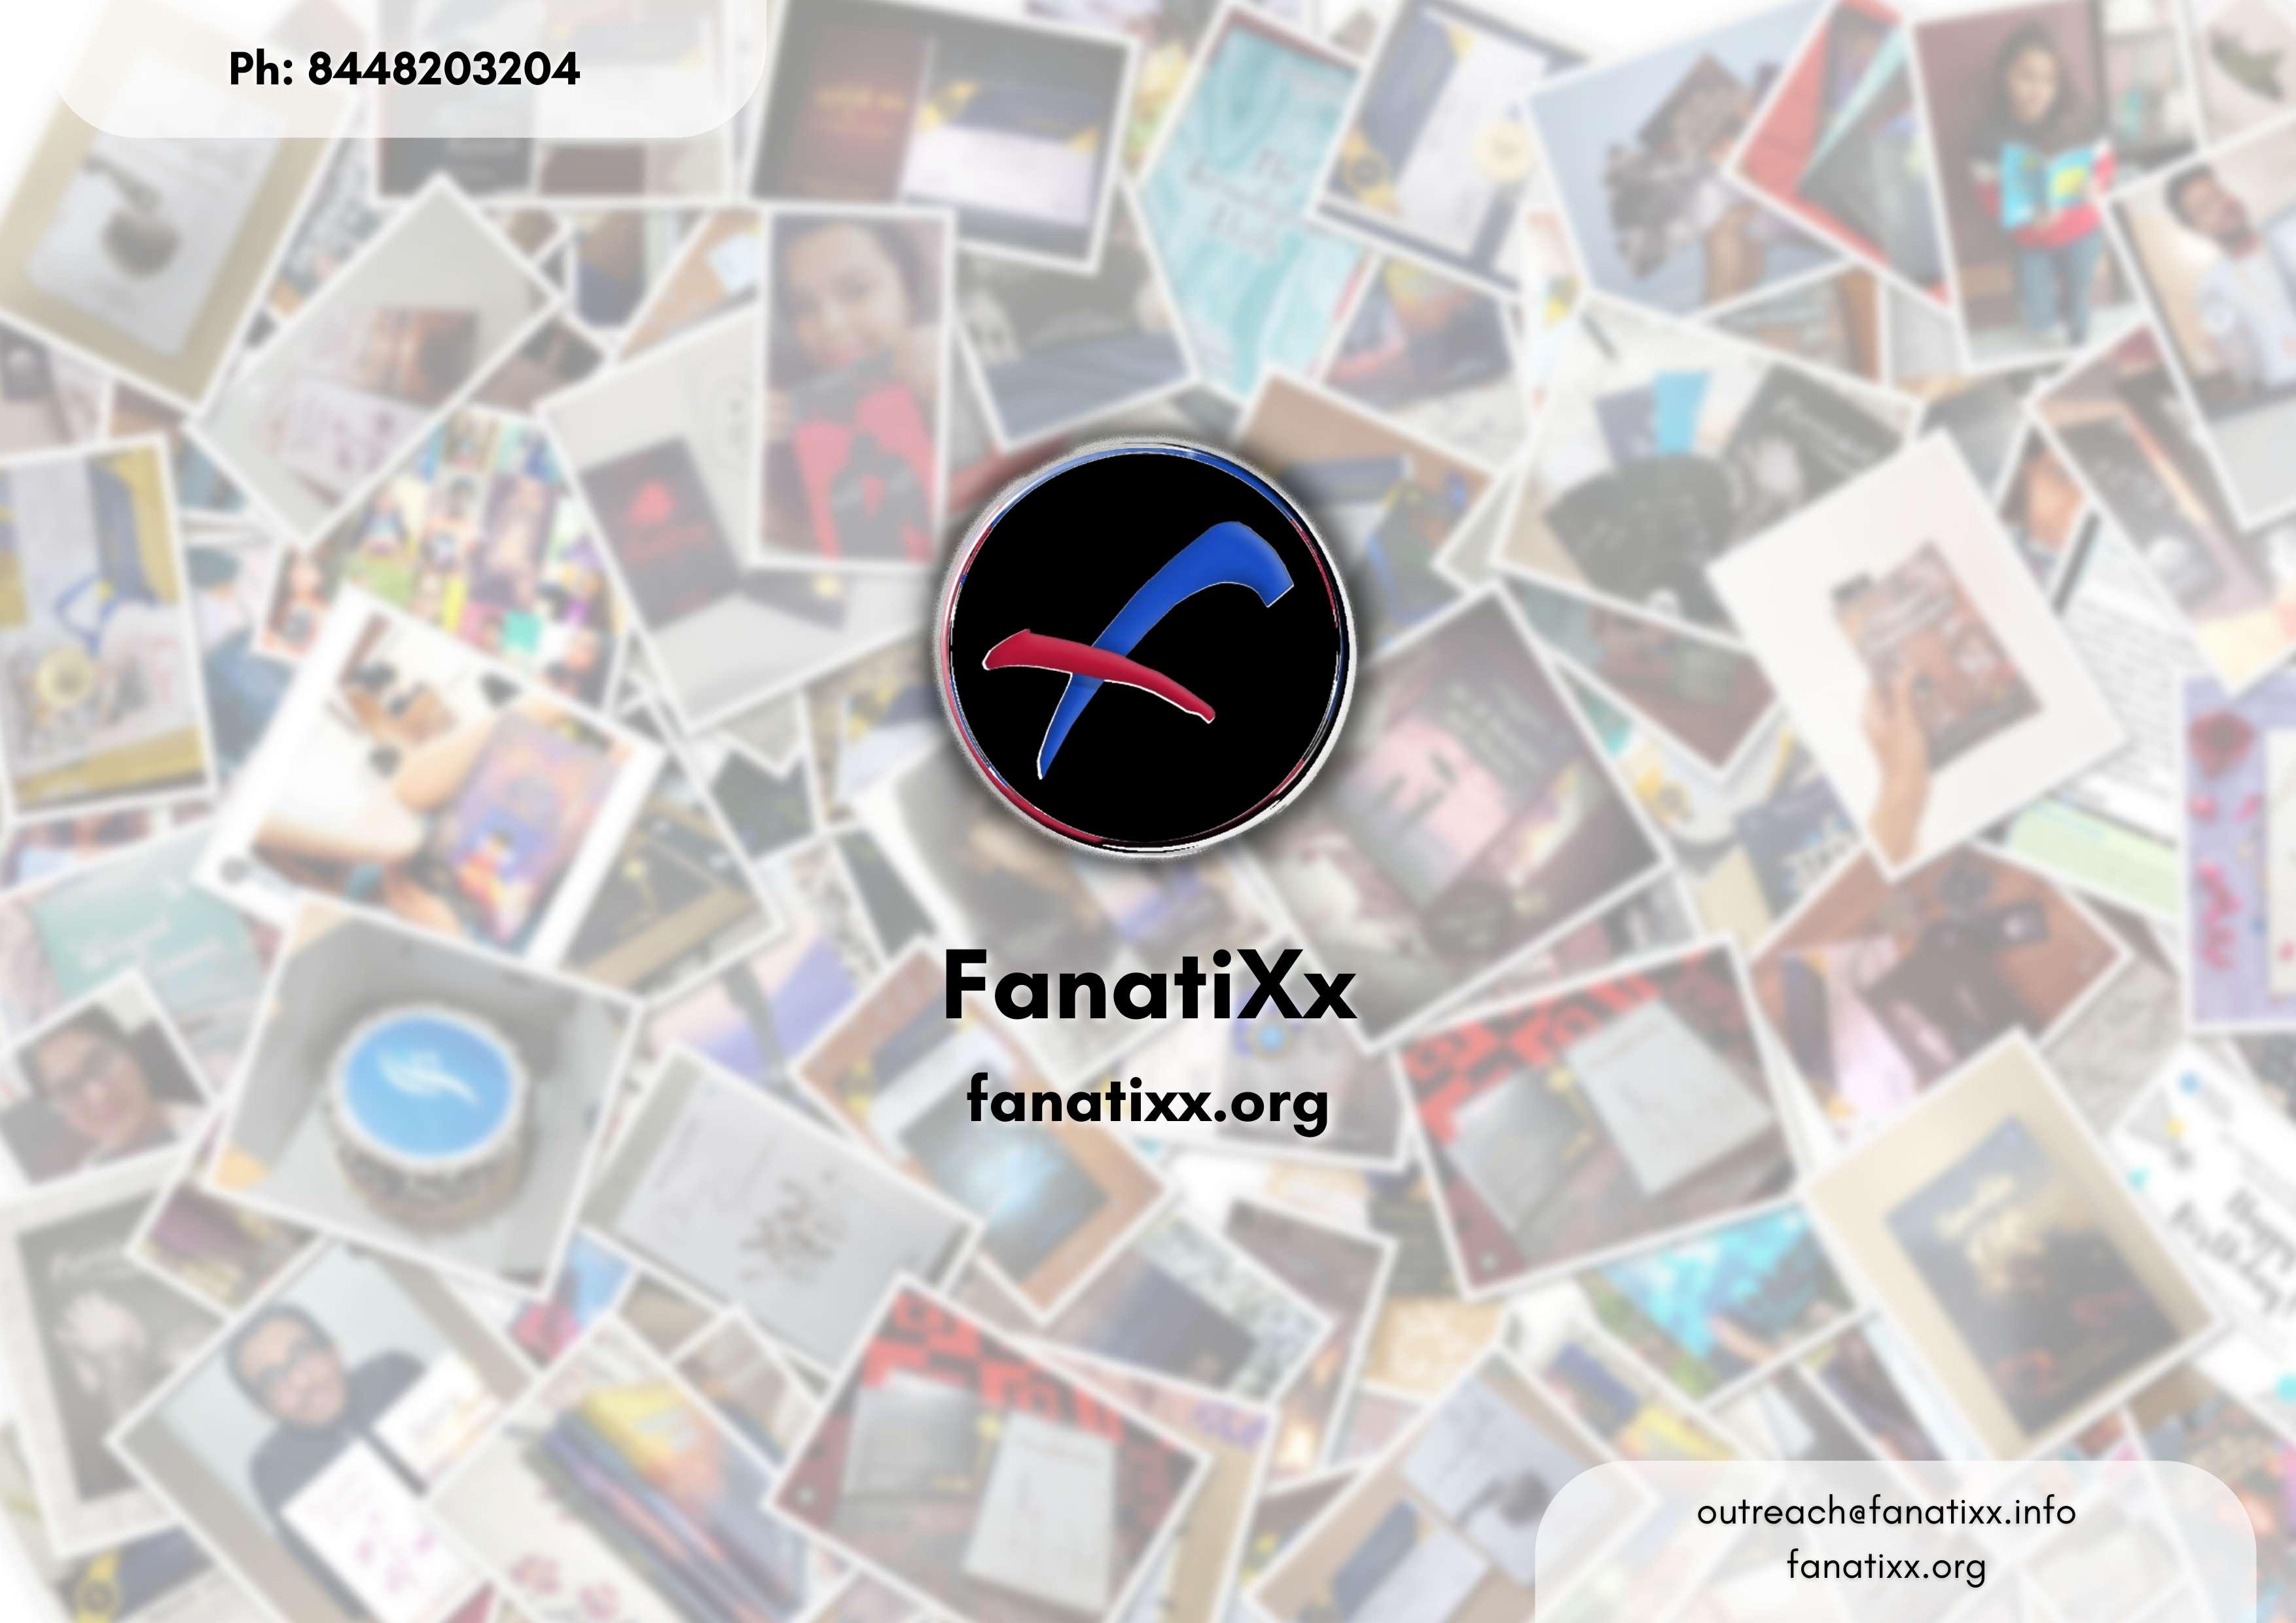 FanatiXx - Brand of Brands, The Creators' guide by Hemant Bansal